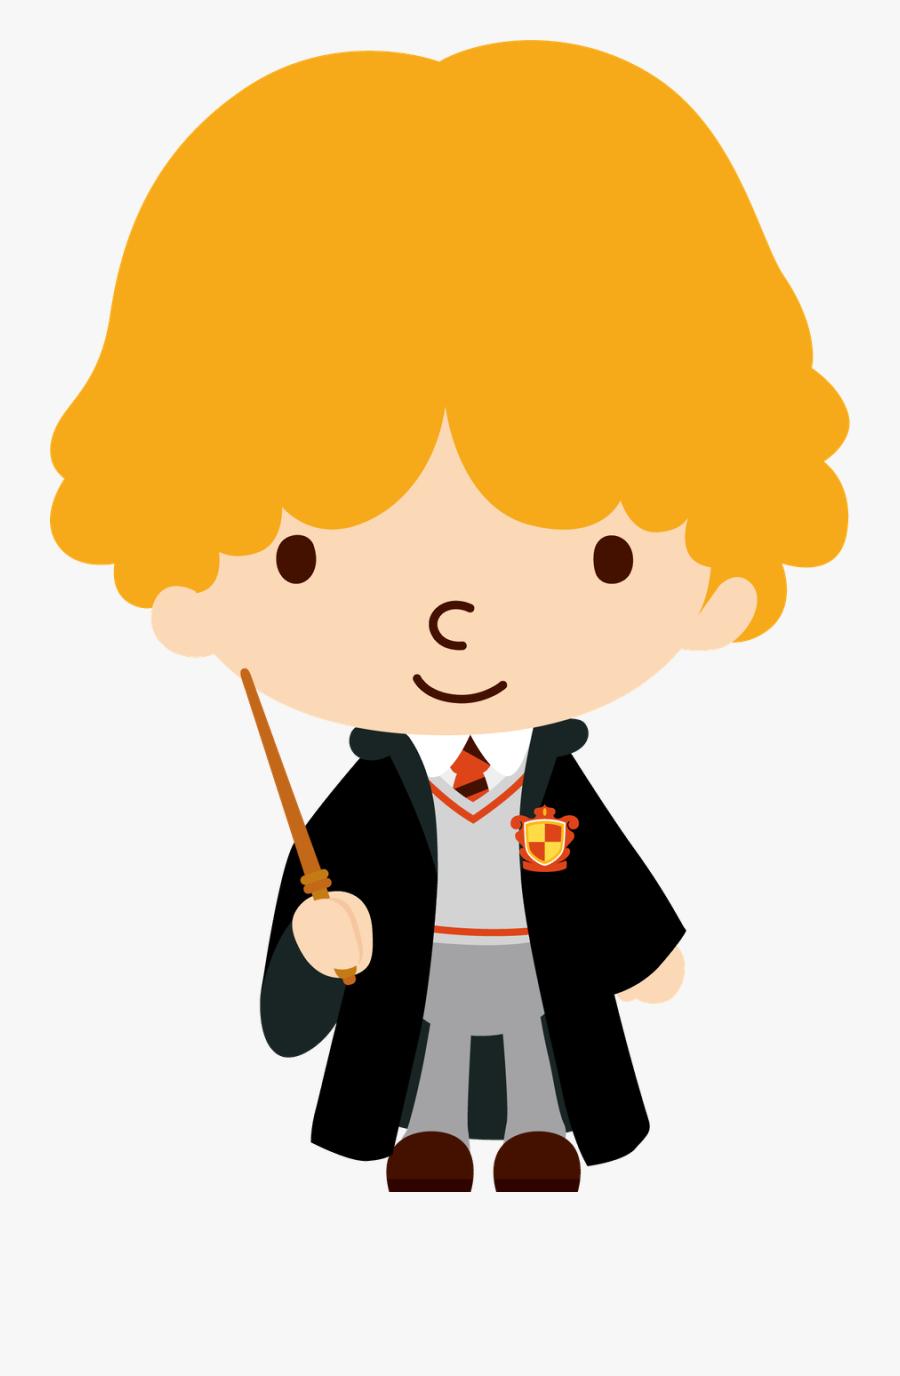 Harry Potter Clipart Burrow - Harry Potter Character Clip Art, Transparent Clipart